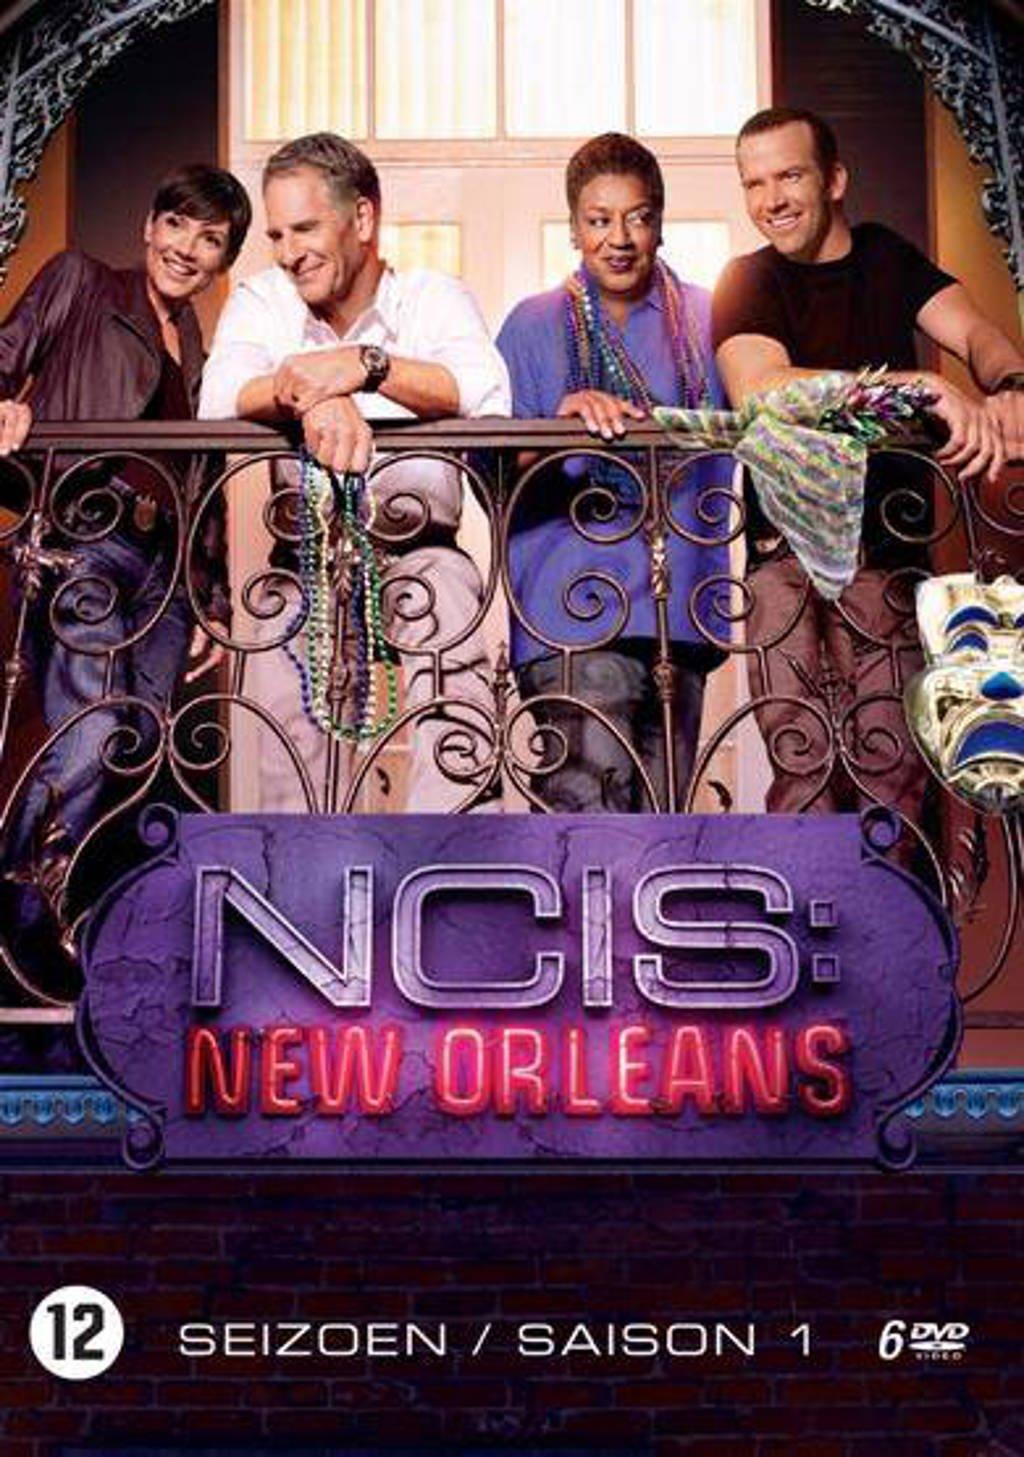 NCIS New Orleans - Seizoen 1 (DVD)